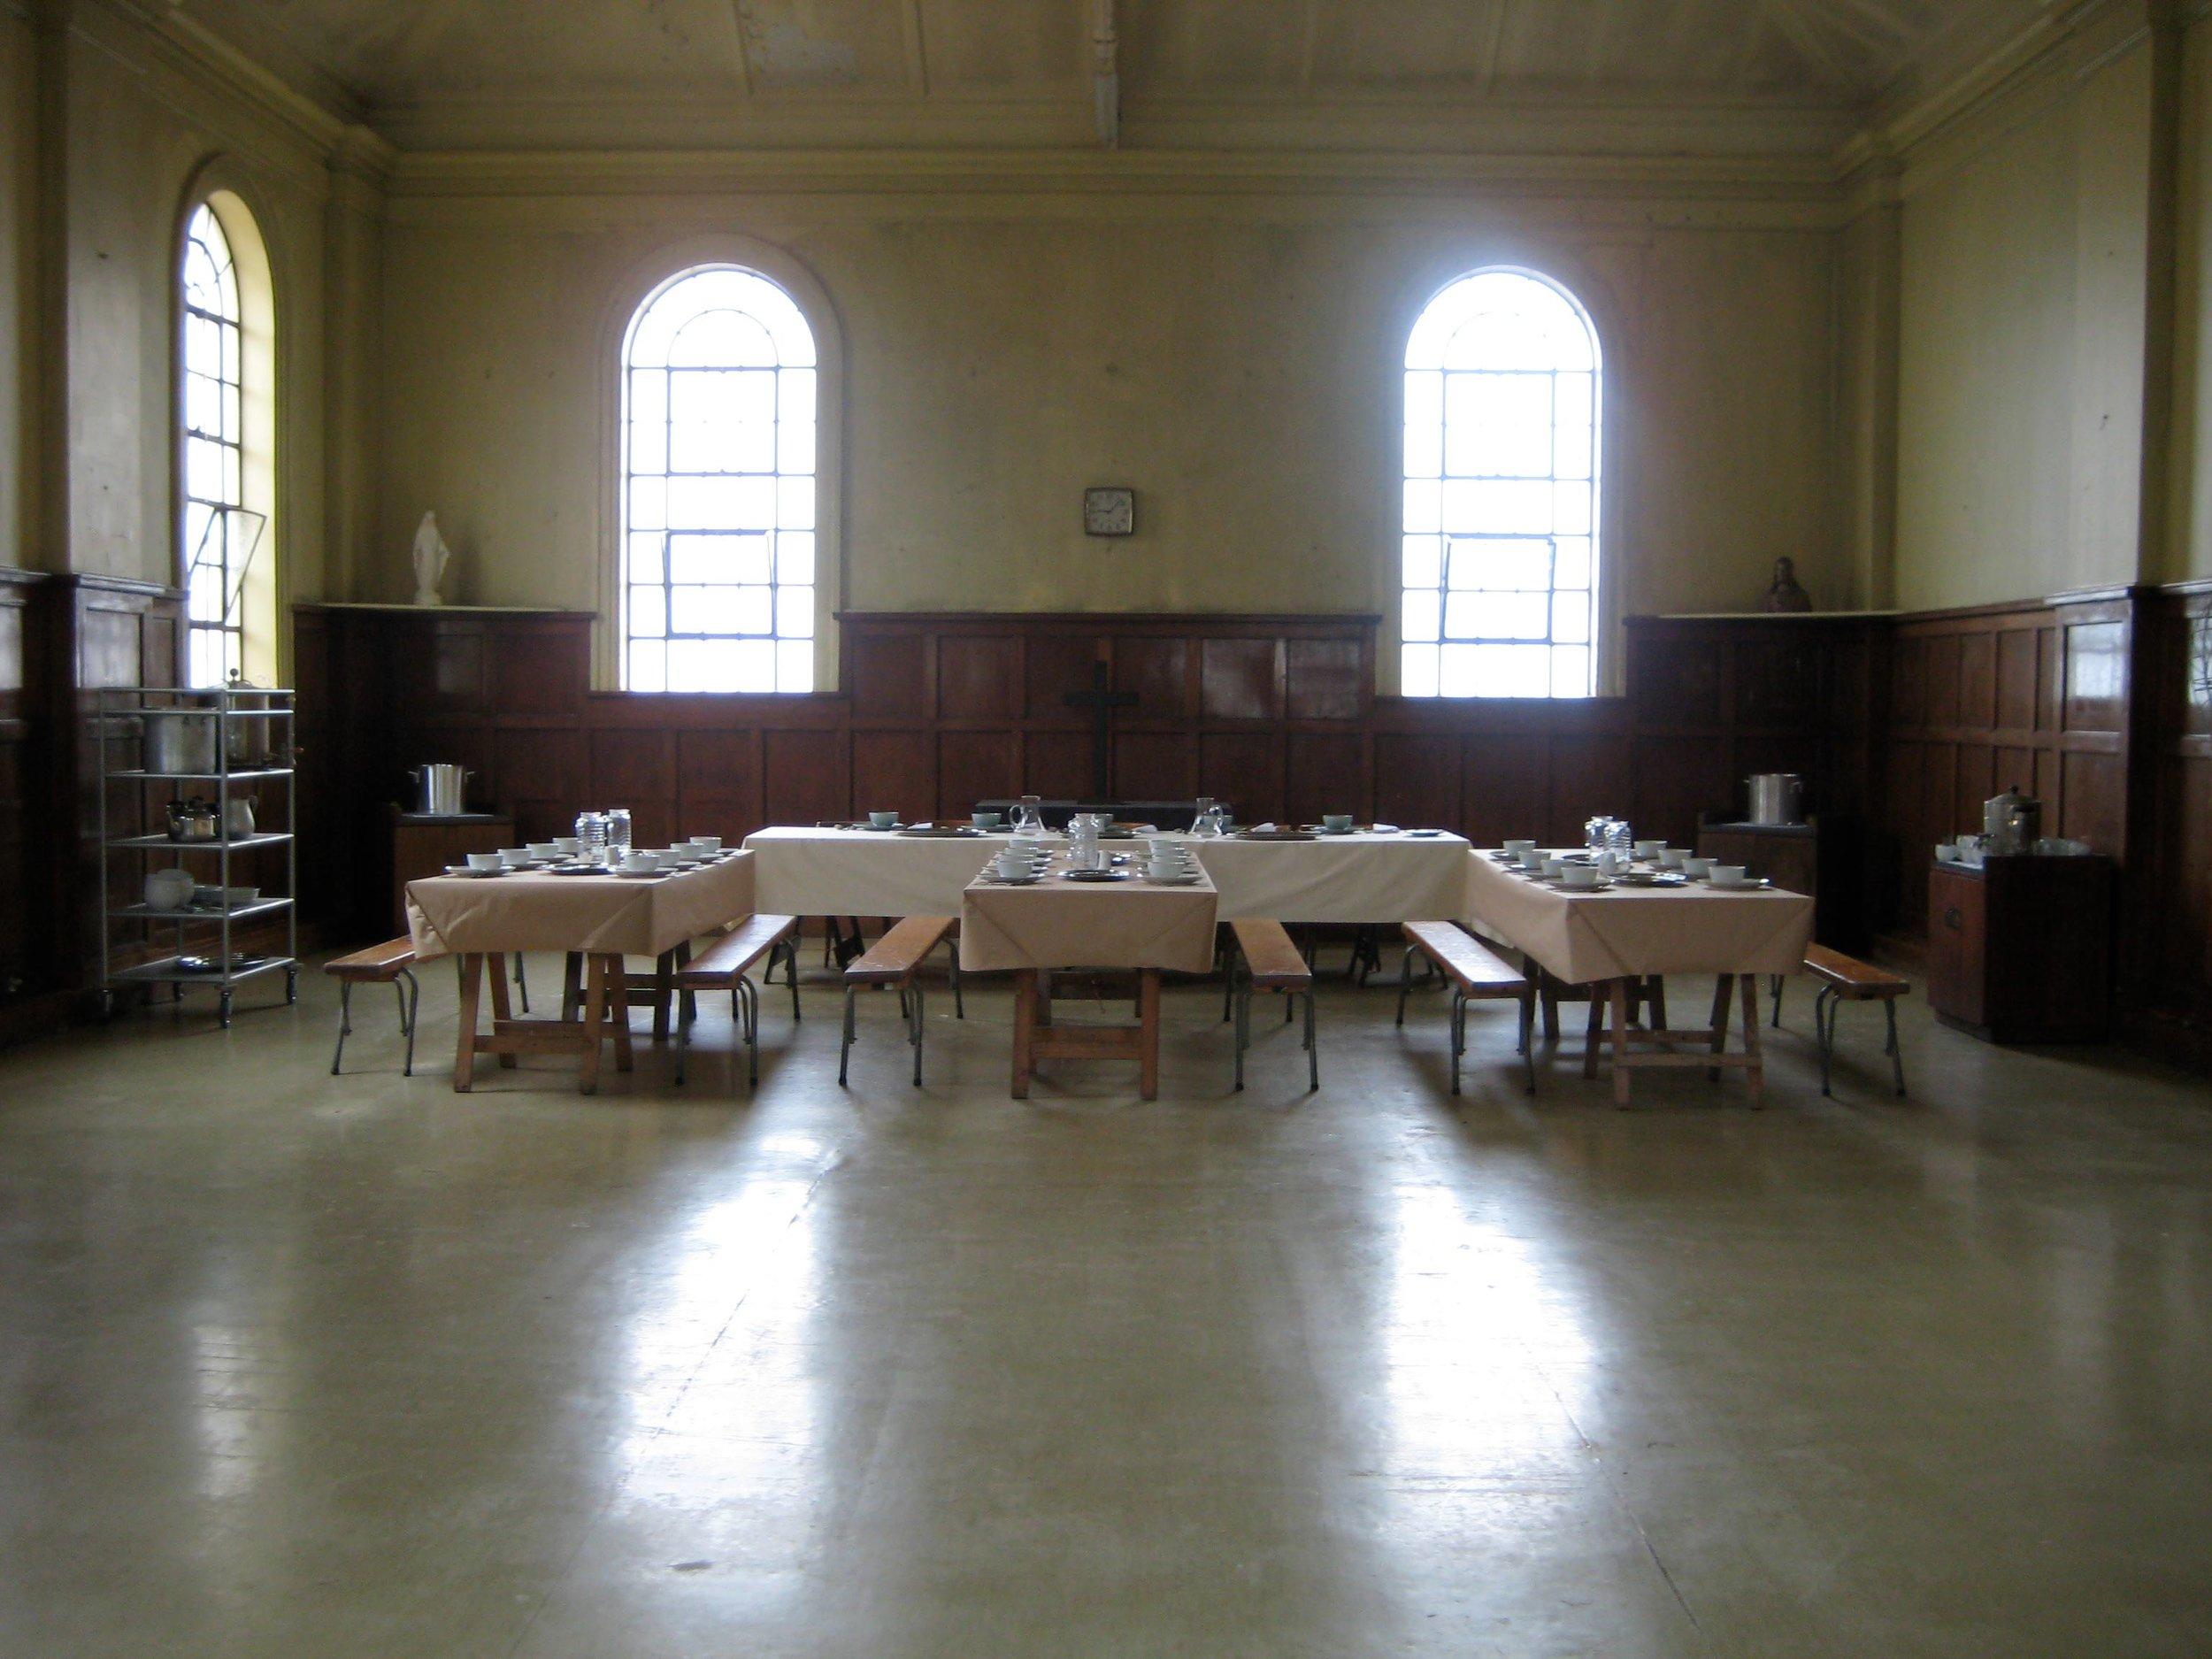 Dining Hall 1968 - Dressed set